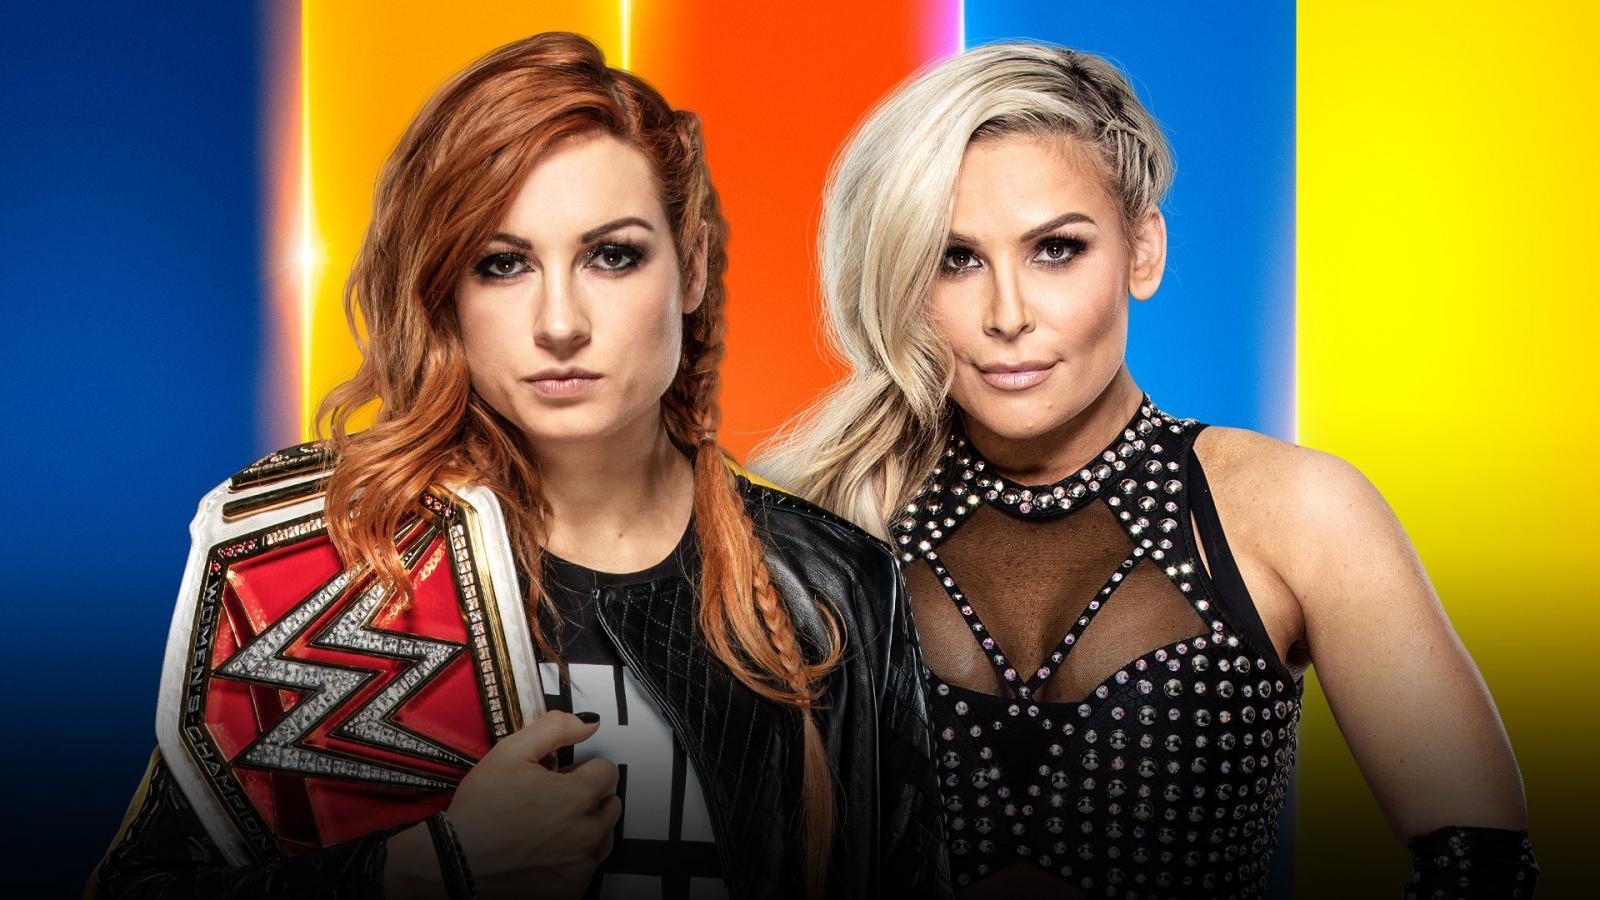 Stipulation added to RAW Women's Championship match at SummerSlam